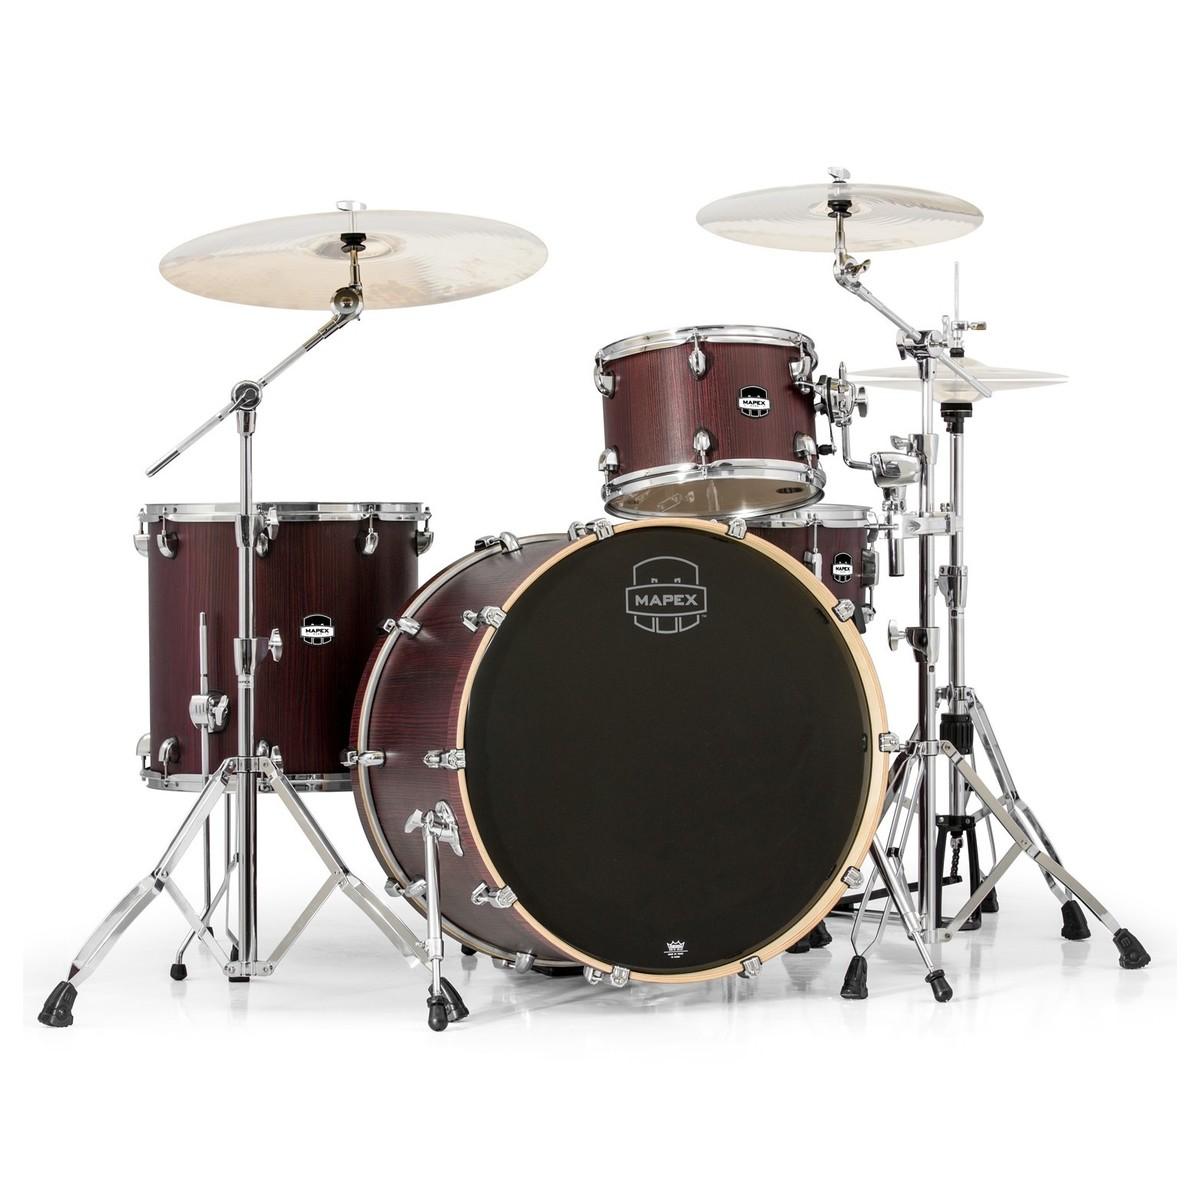 mapex mars 446 big beat 24 39 39 4 piece drum kit bloodwood at gear4music. Black Bedroom Furniture Sets. Home Design Ideas